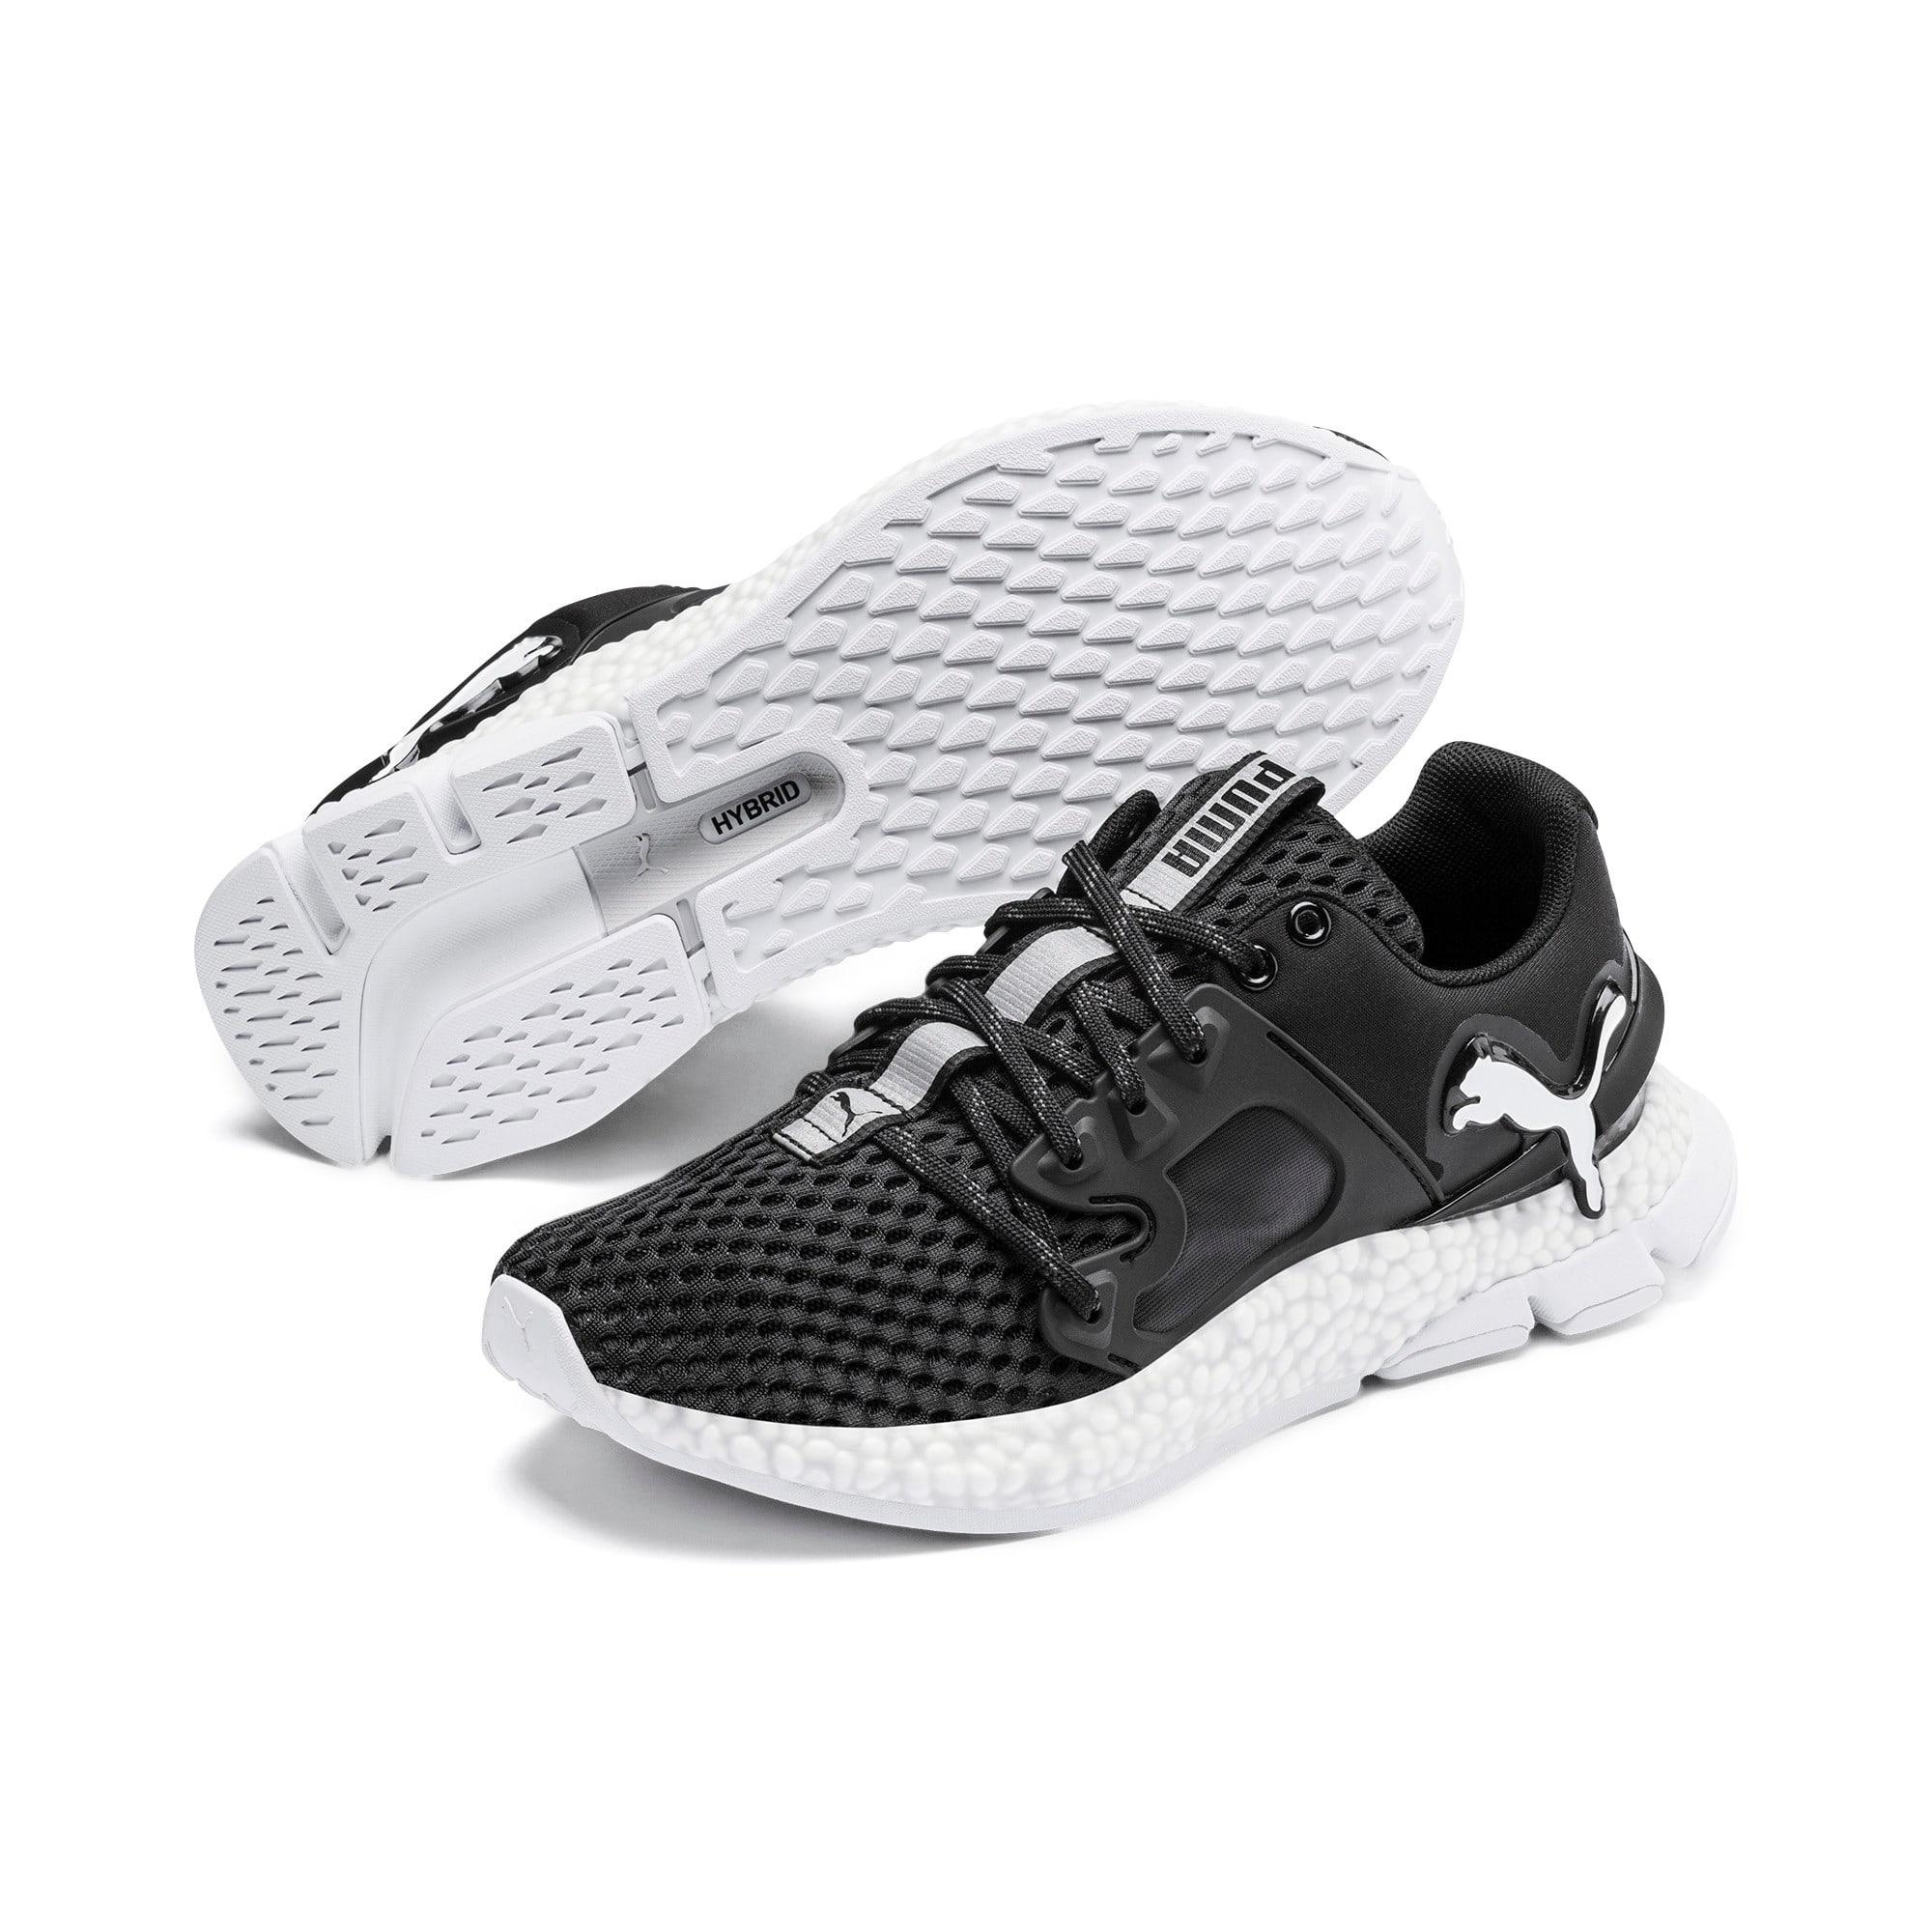 Thumbnail 3 of HYBRID Sky Women's Running Shoes, Puma Black-Puma White, medium